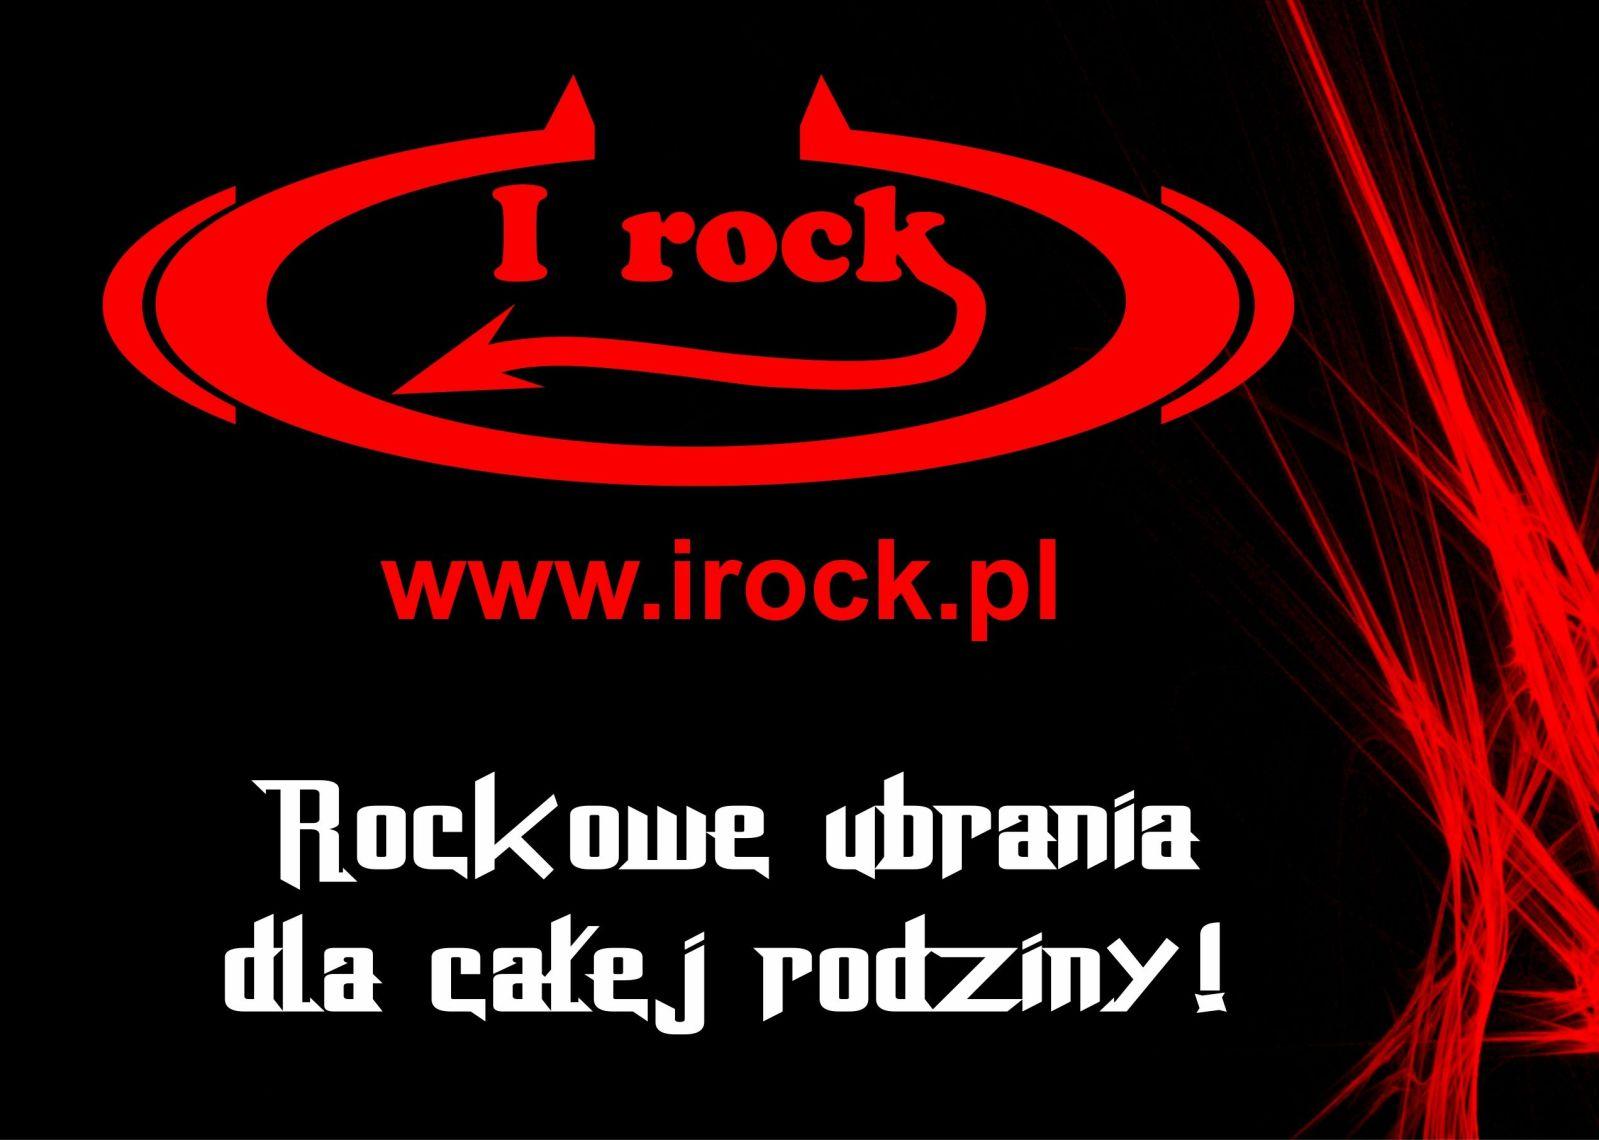 www.irock.pl